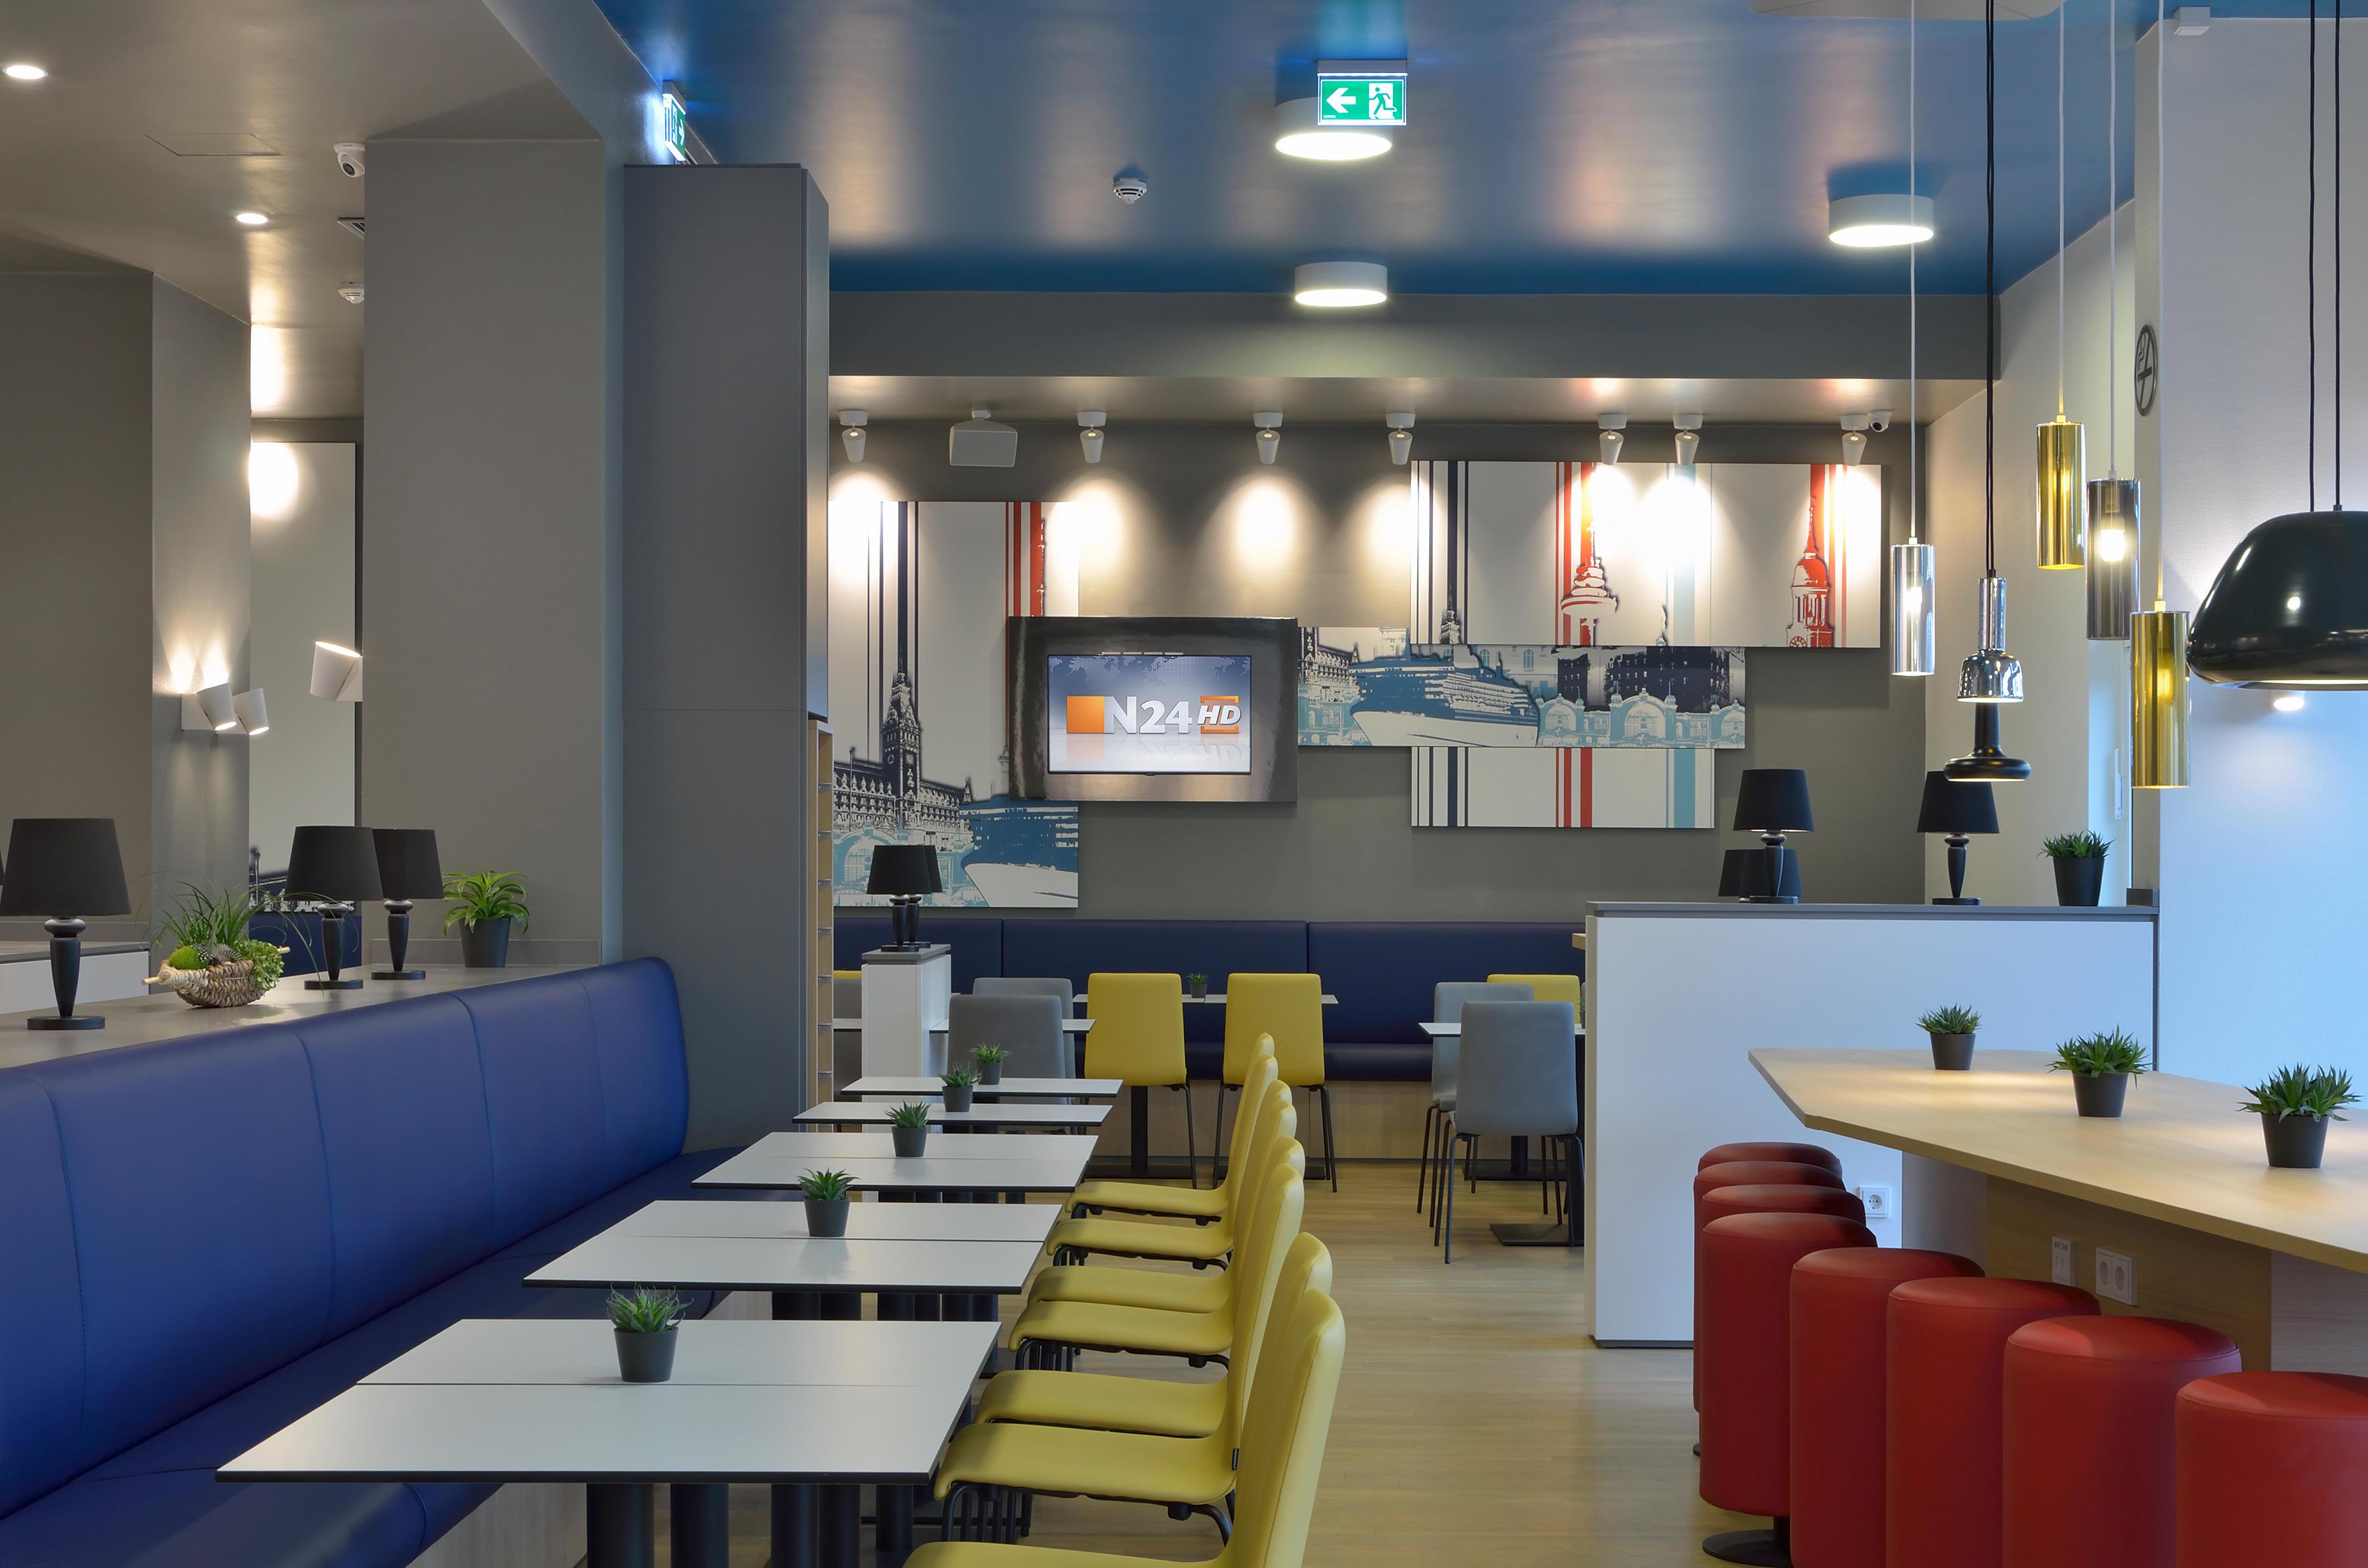 b b hotel hamburg city ost hotels hamburg. Black Bedroom Furniture Sets. Home Design Ideas